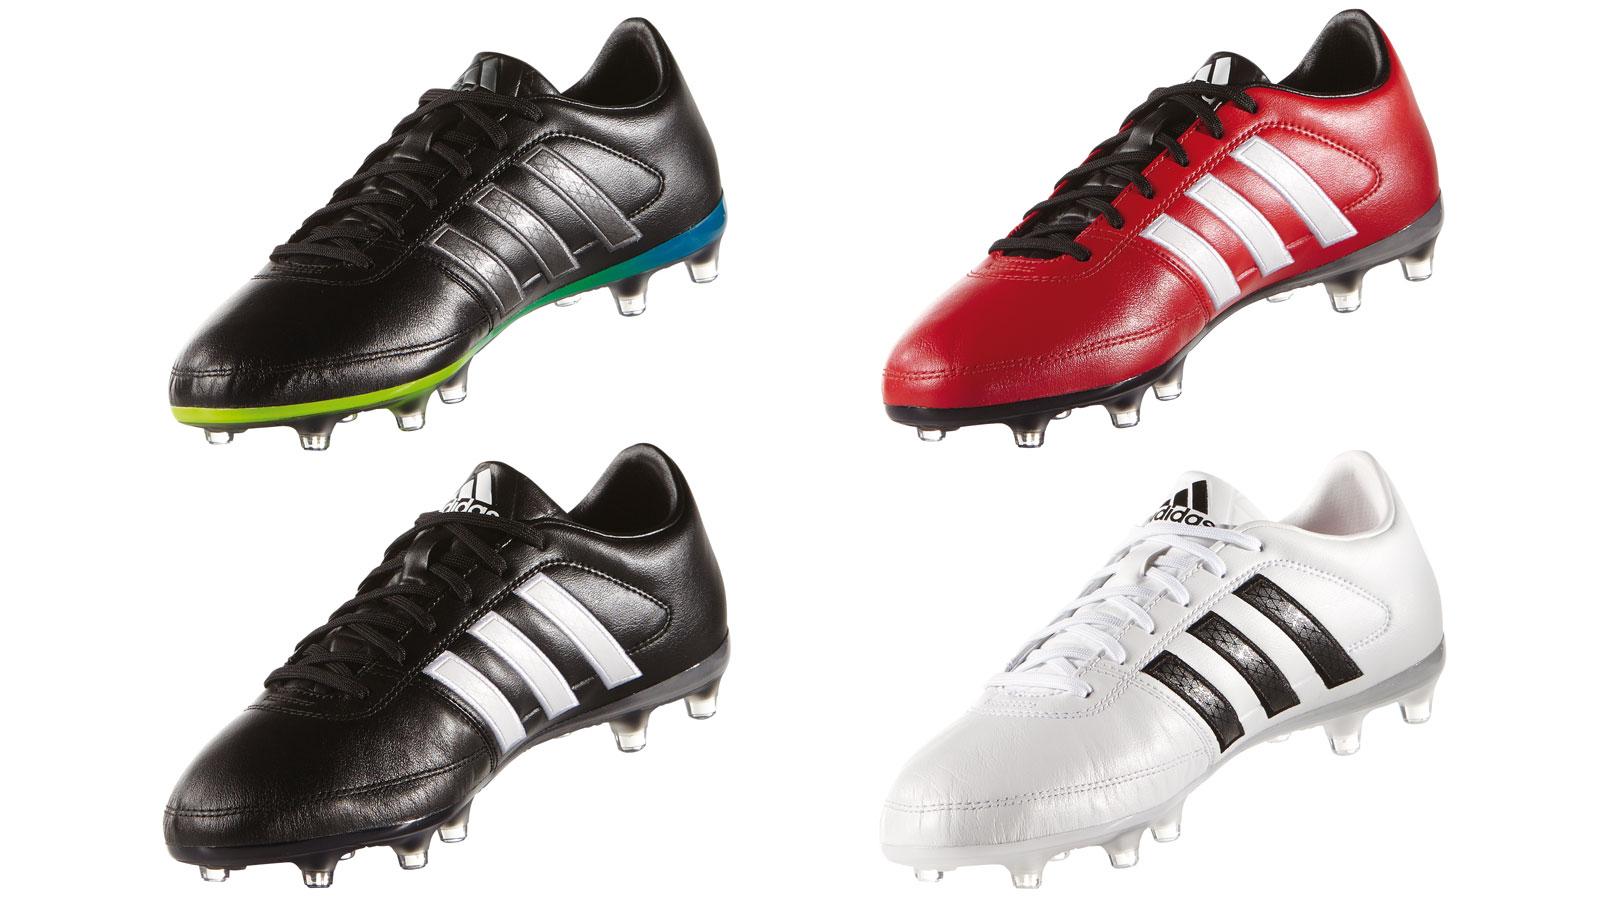 Adidas Gloro 16.1 FG Farben